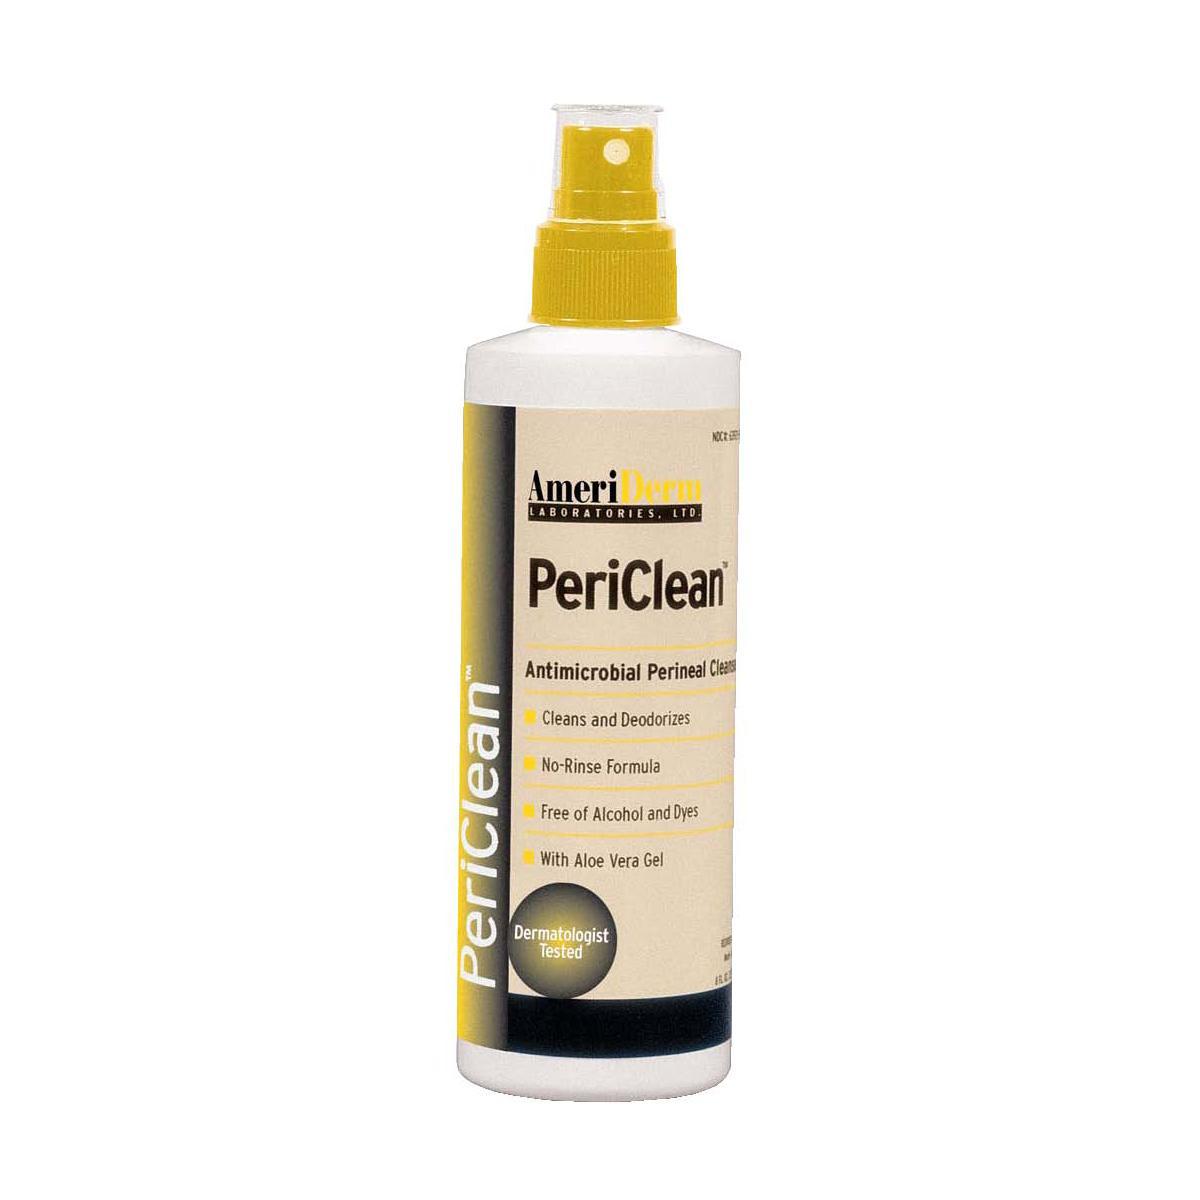 Periclean Antimicrobial Perineal 8oz